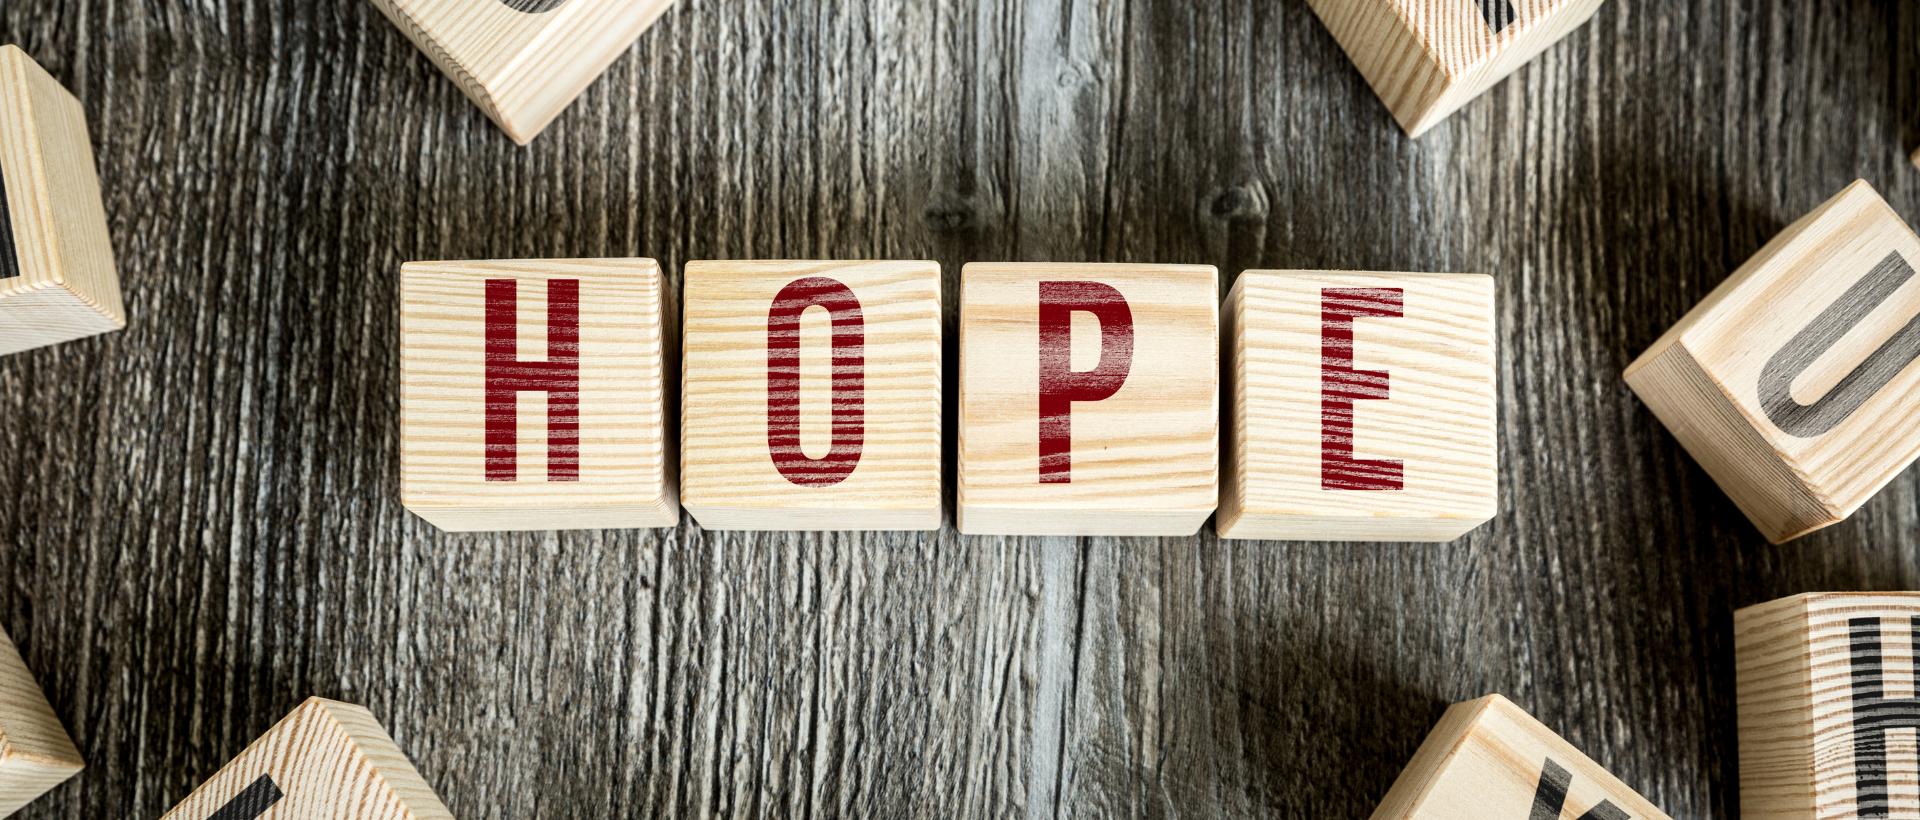 HOPE in block letters